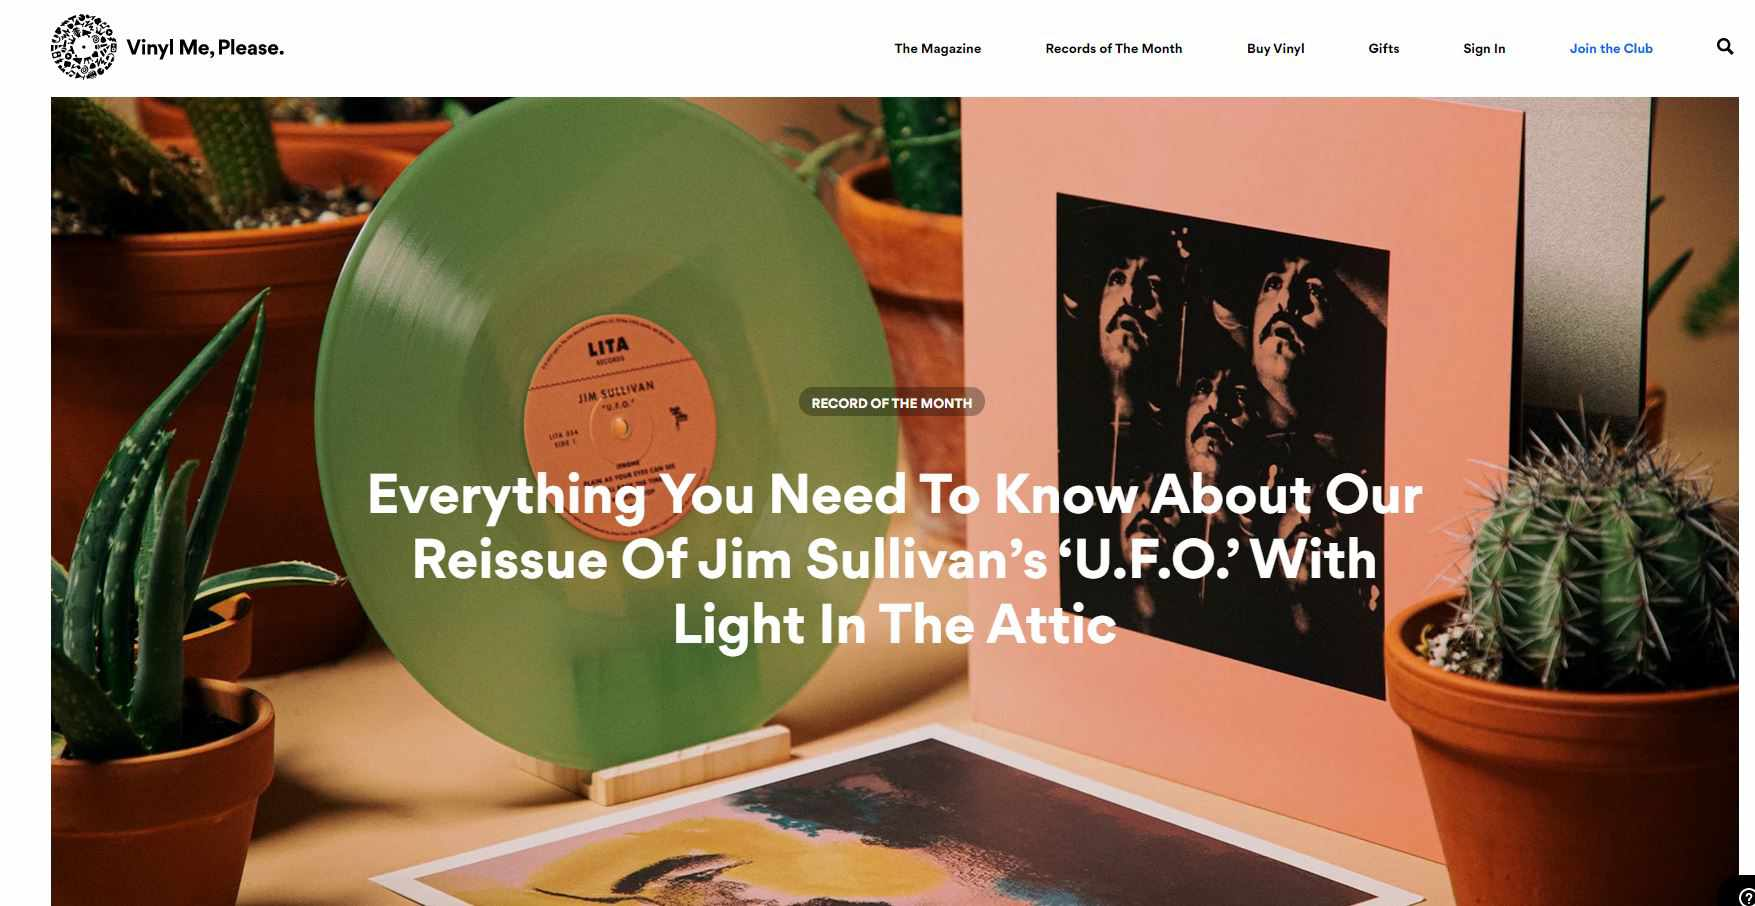 Screenshot of Vinyl Me, Please